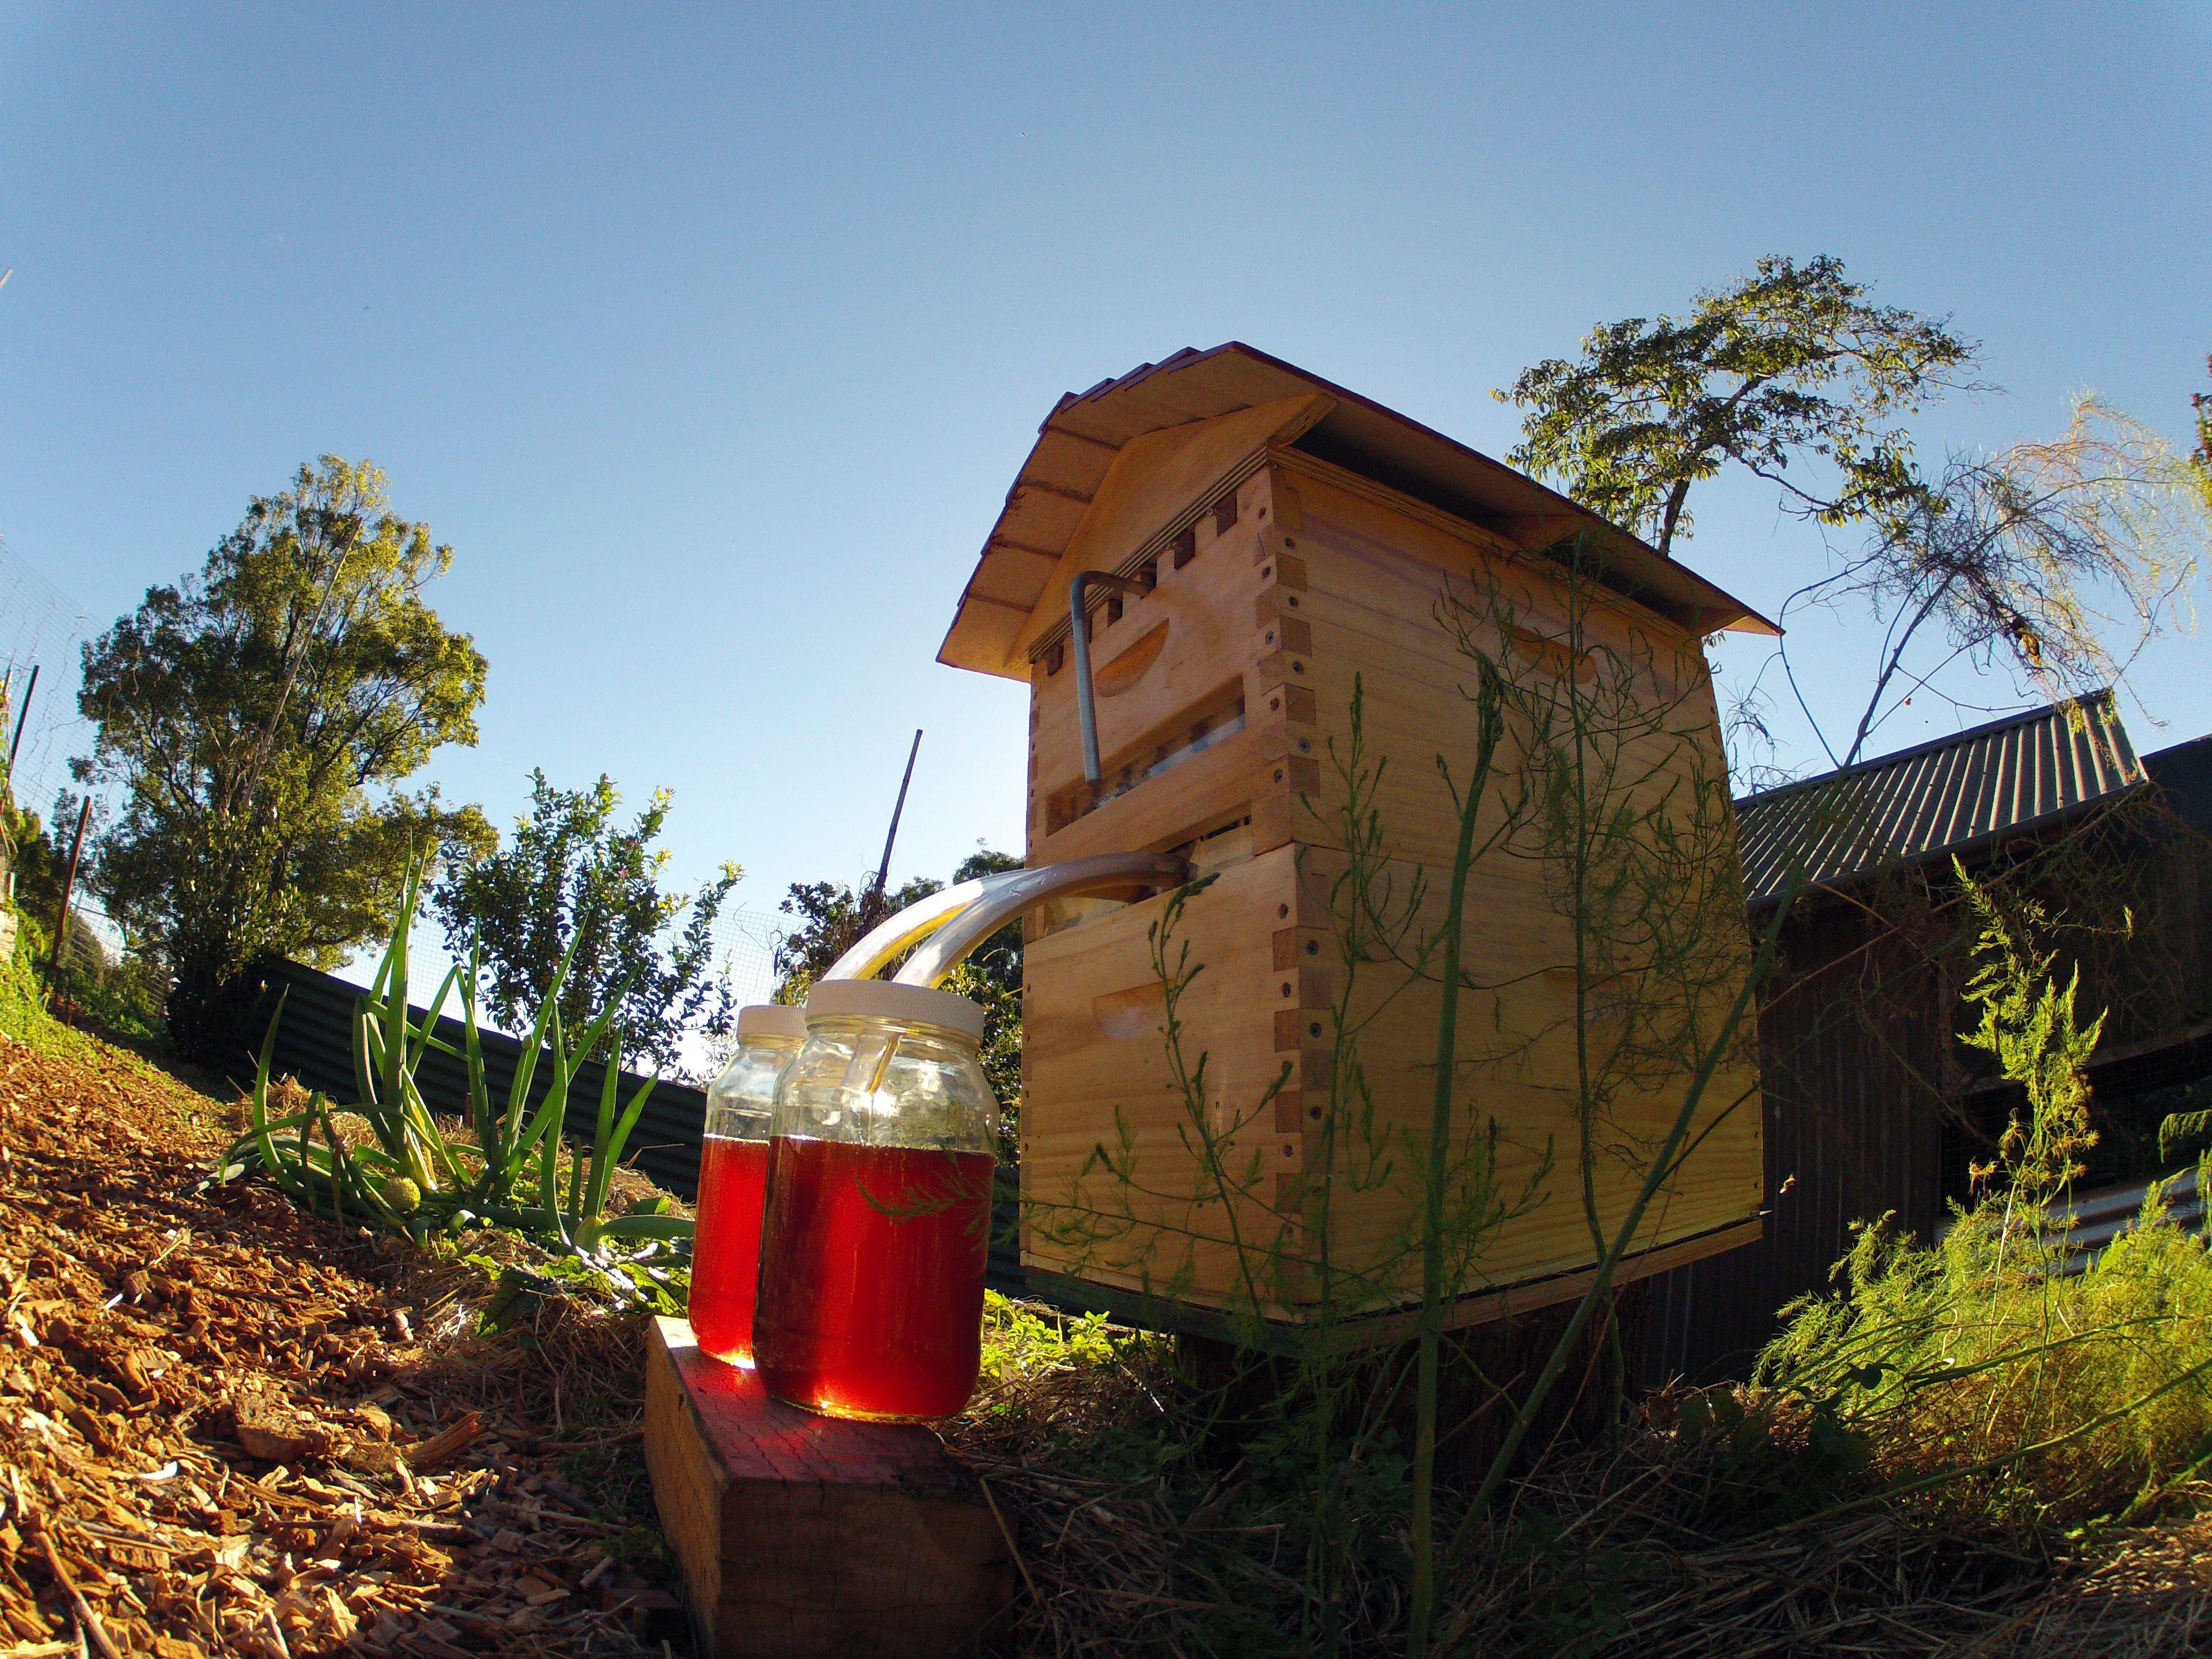 This 'Honey on Tap' Beehive Design Just Raised $9 Million on Indiegogo